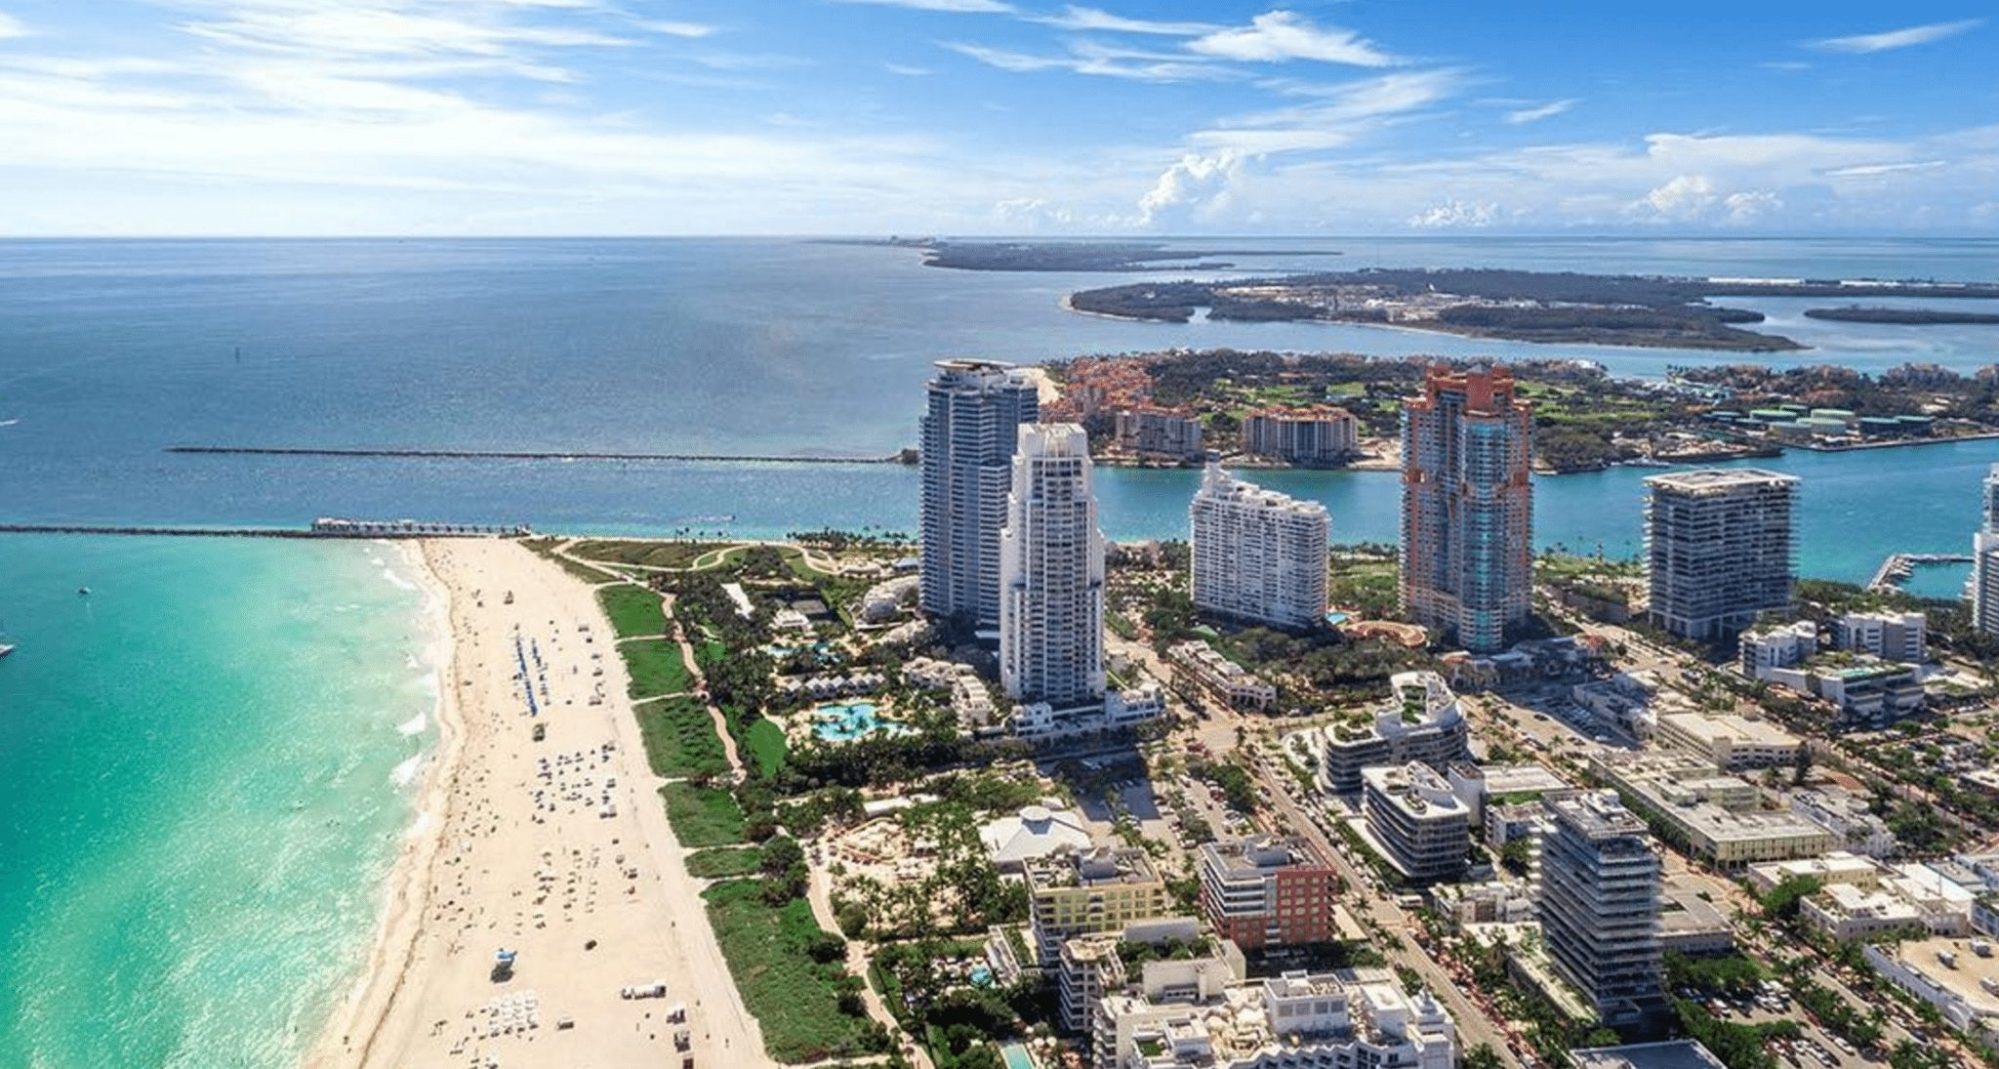 ExperienceSOFI: A Miami Beach Culinary Tour Through South of Fifth